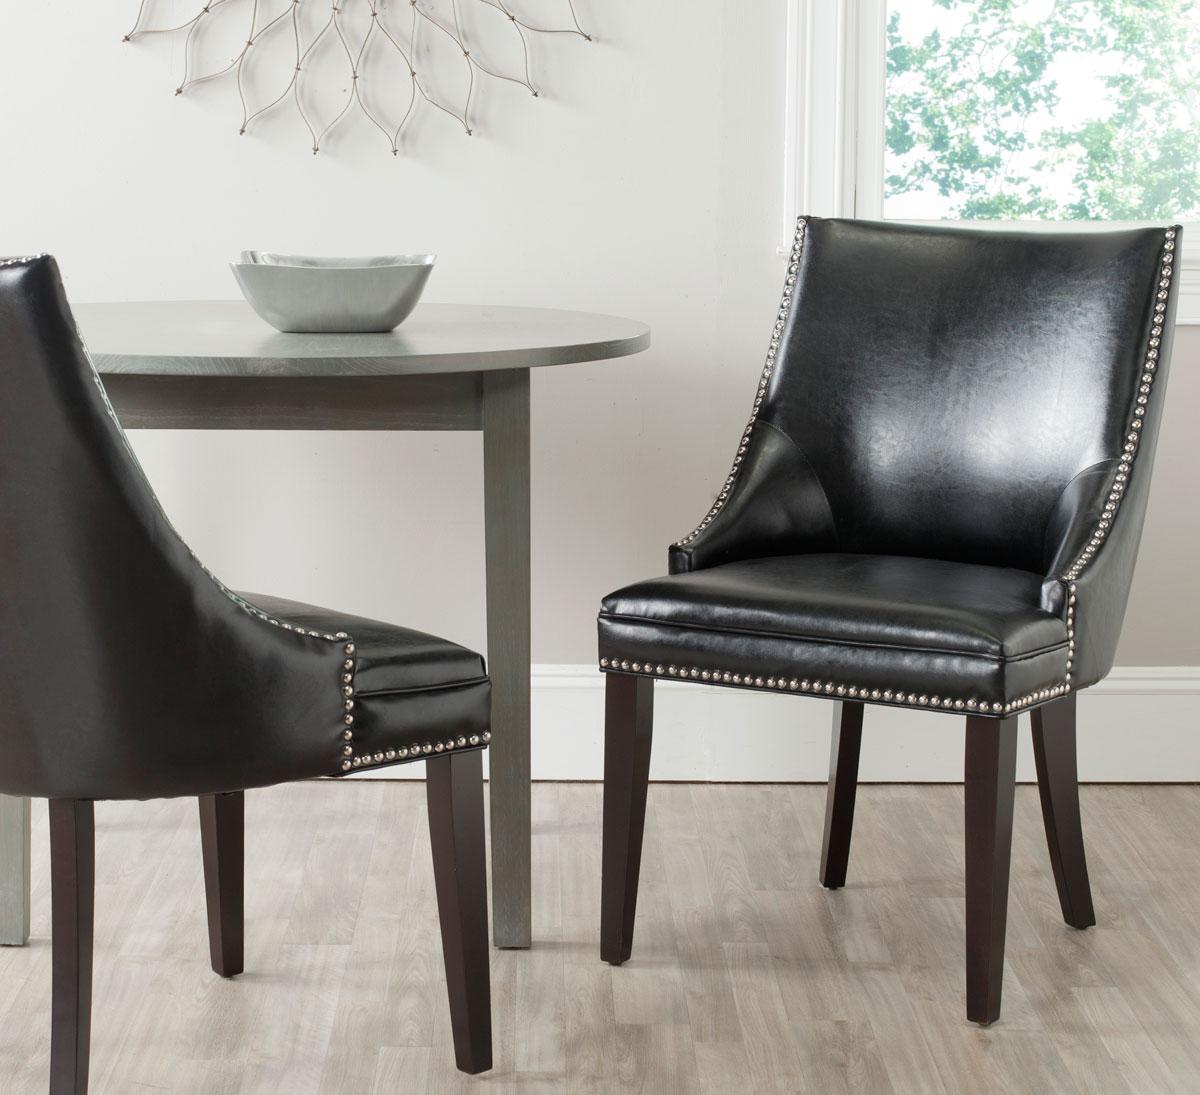 MCR4715E-SET2 Dining Chairs - Furniture by Safavieh  Safavieh